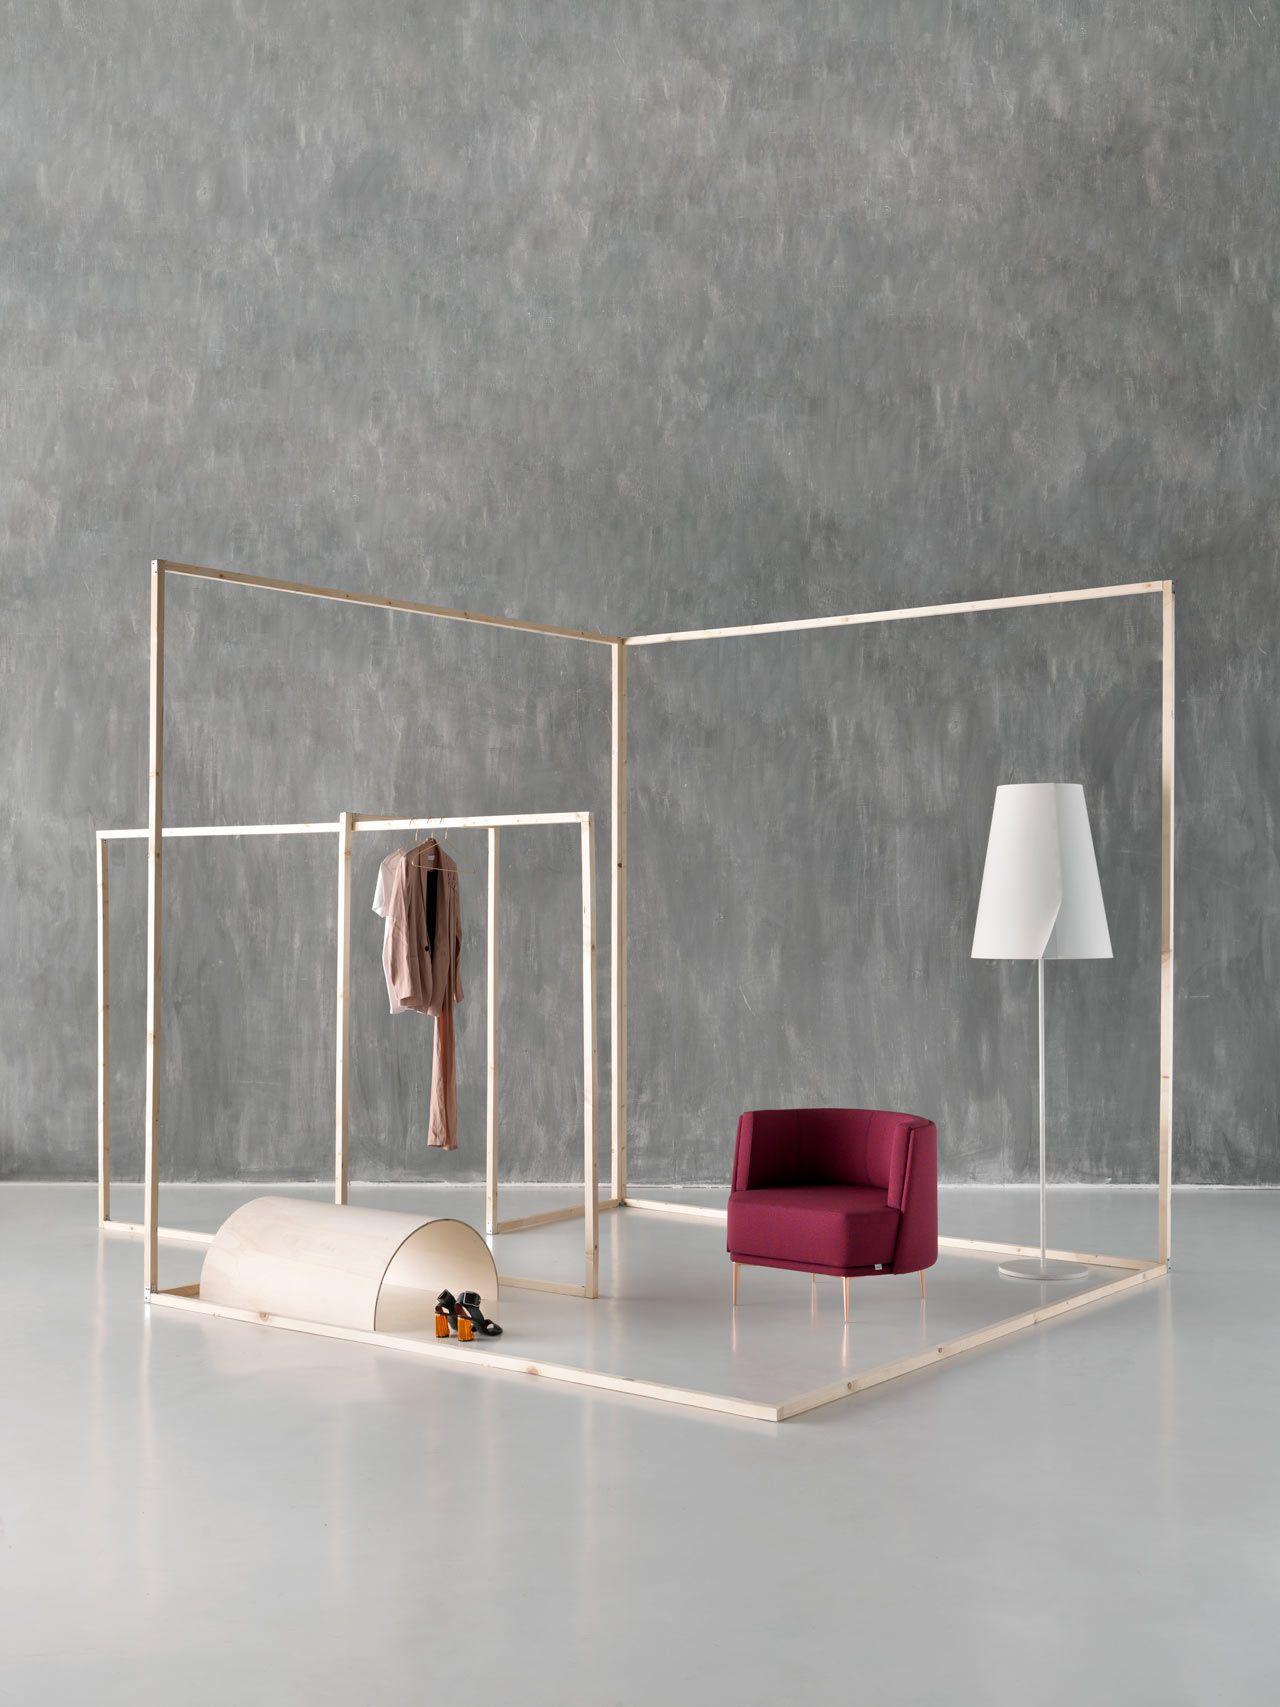 Sitias Furniture Concept For Customizable Environments  Design Milk